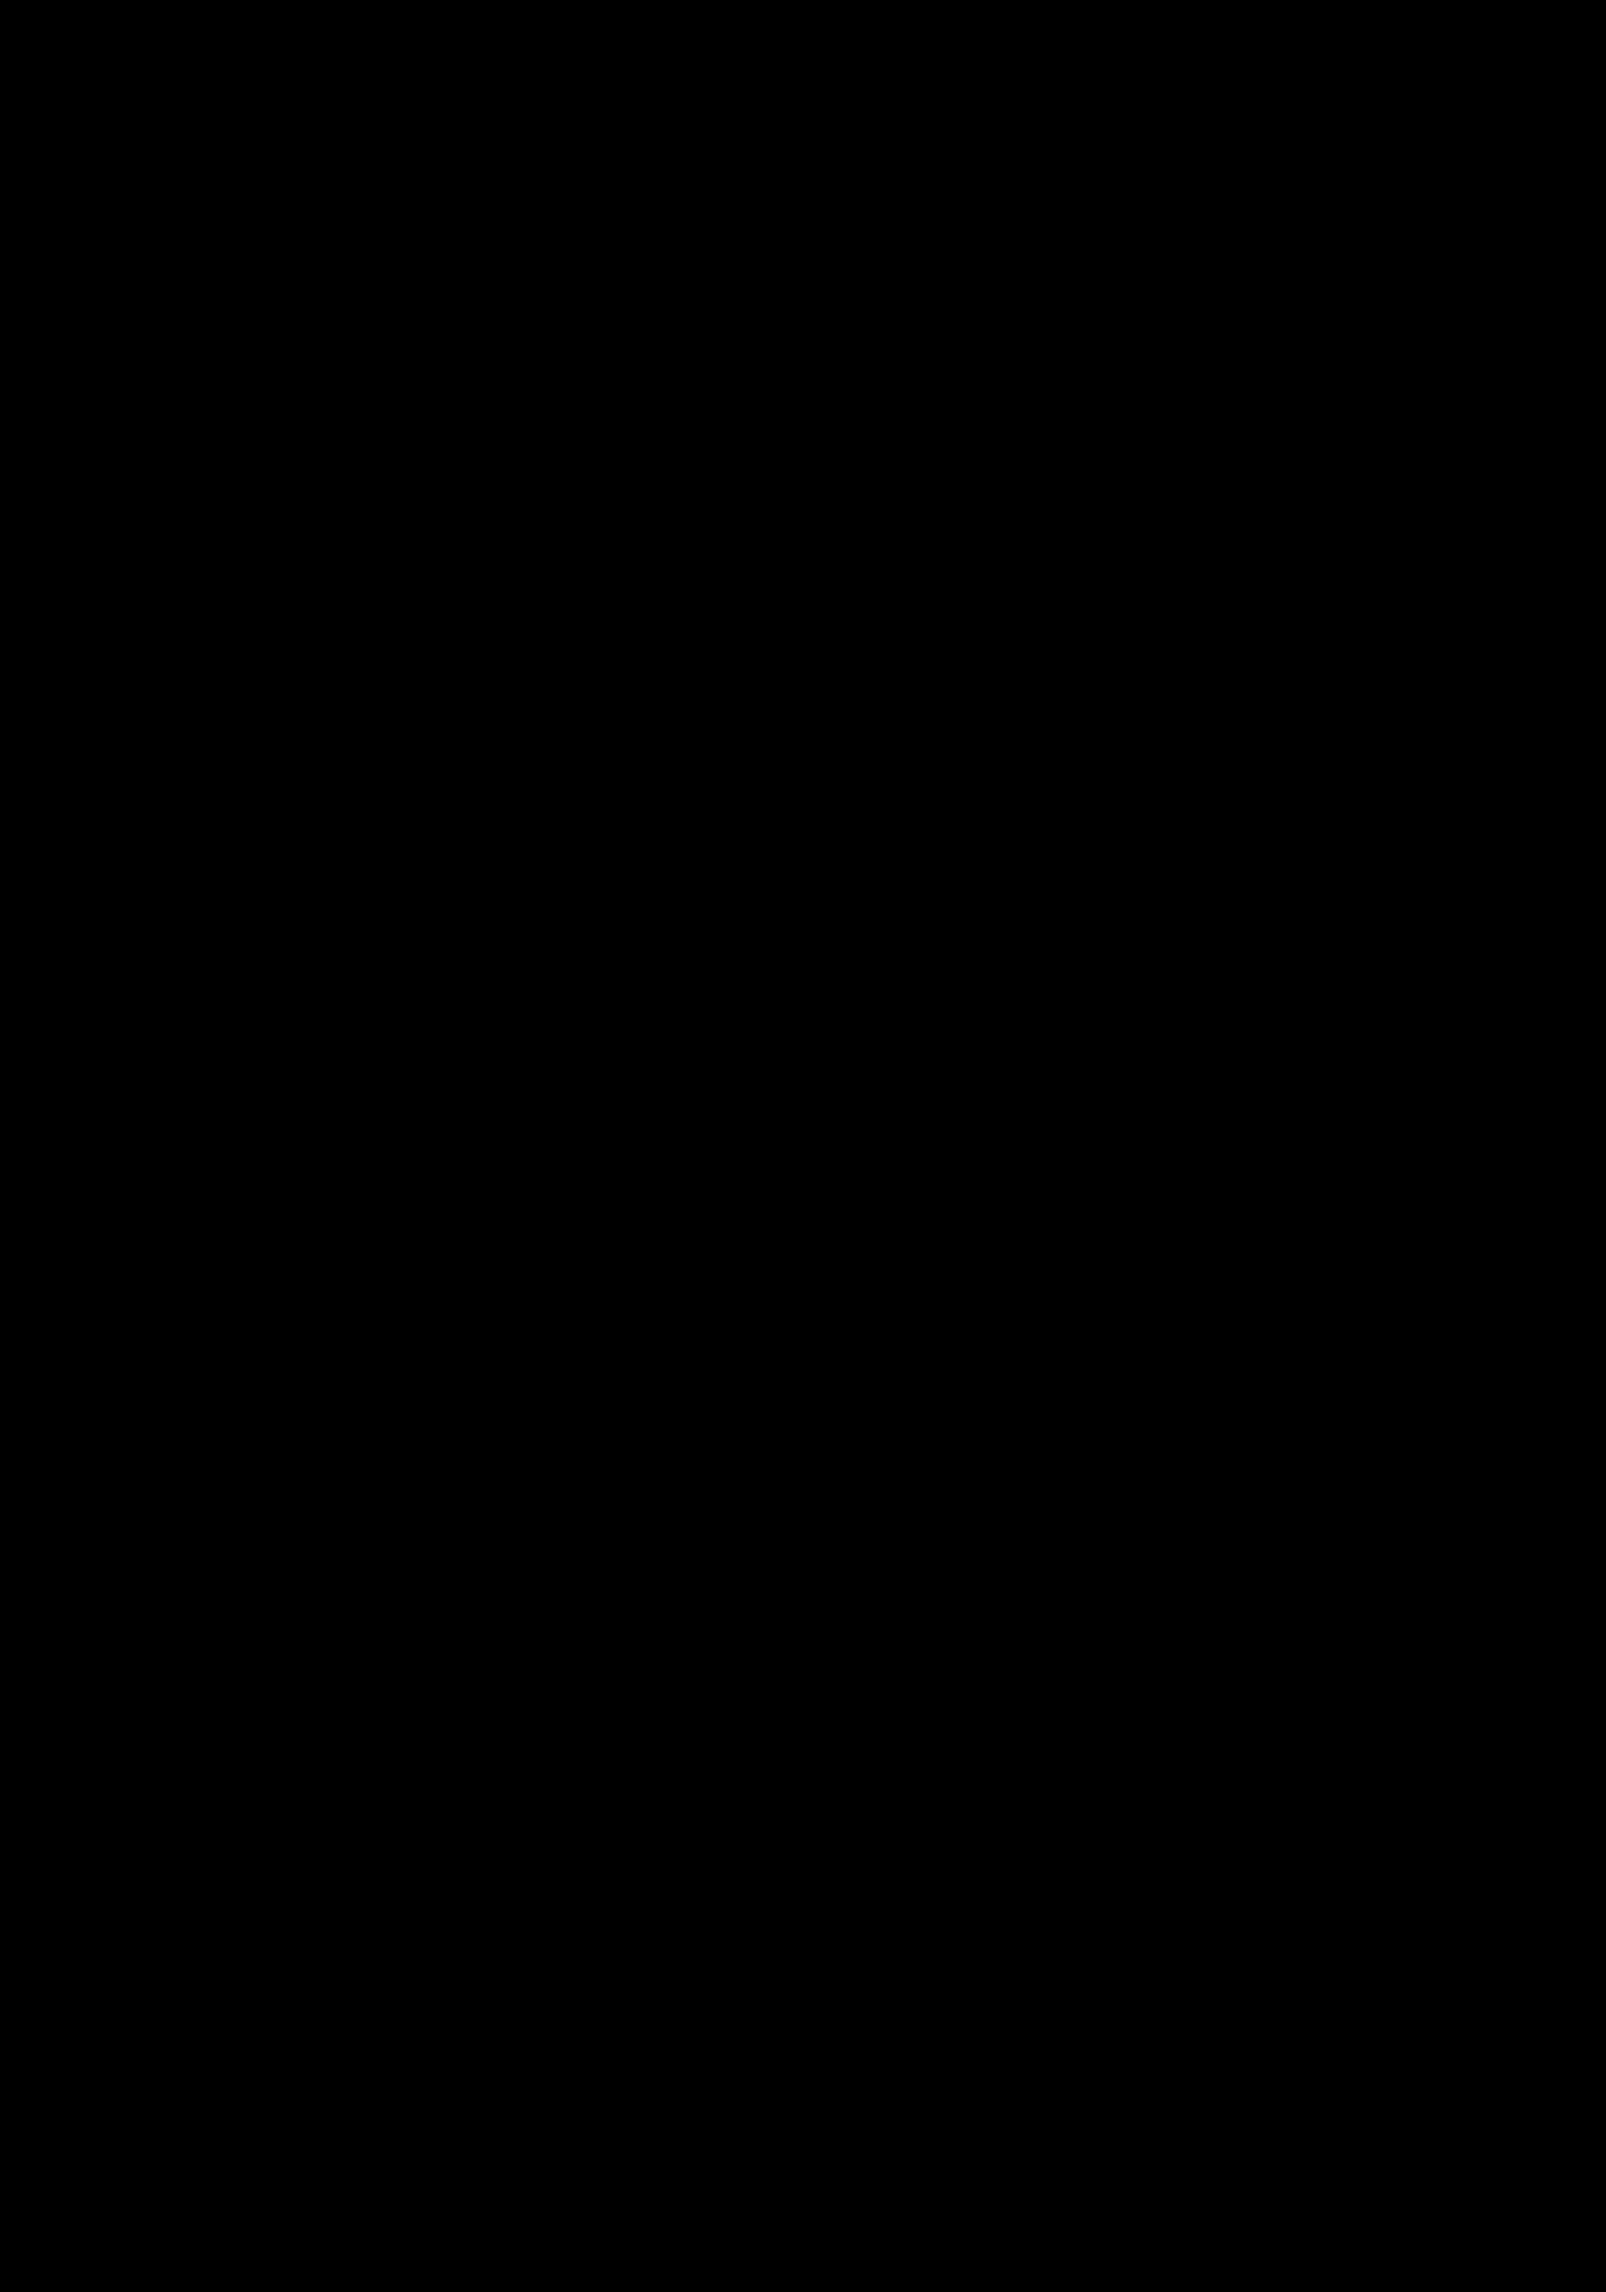 Silhouette llama